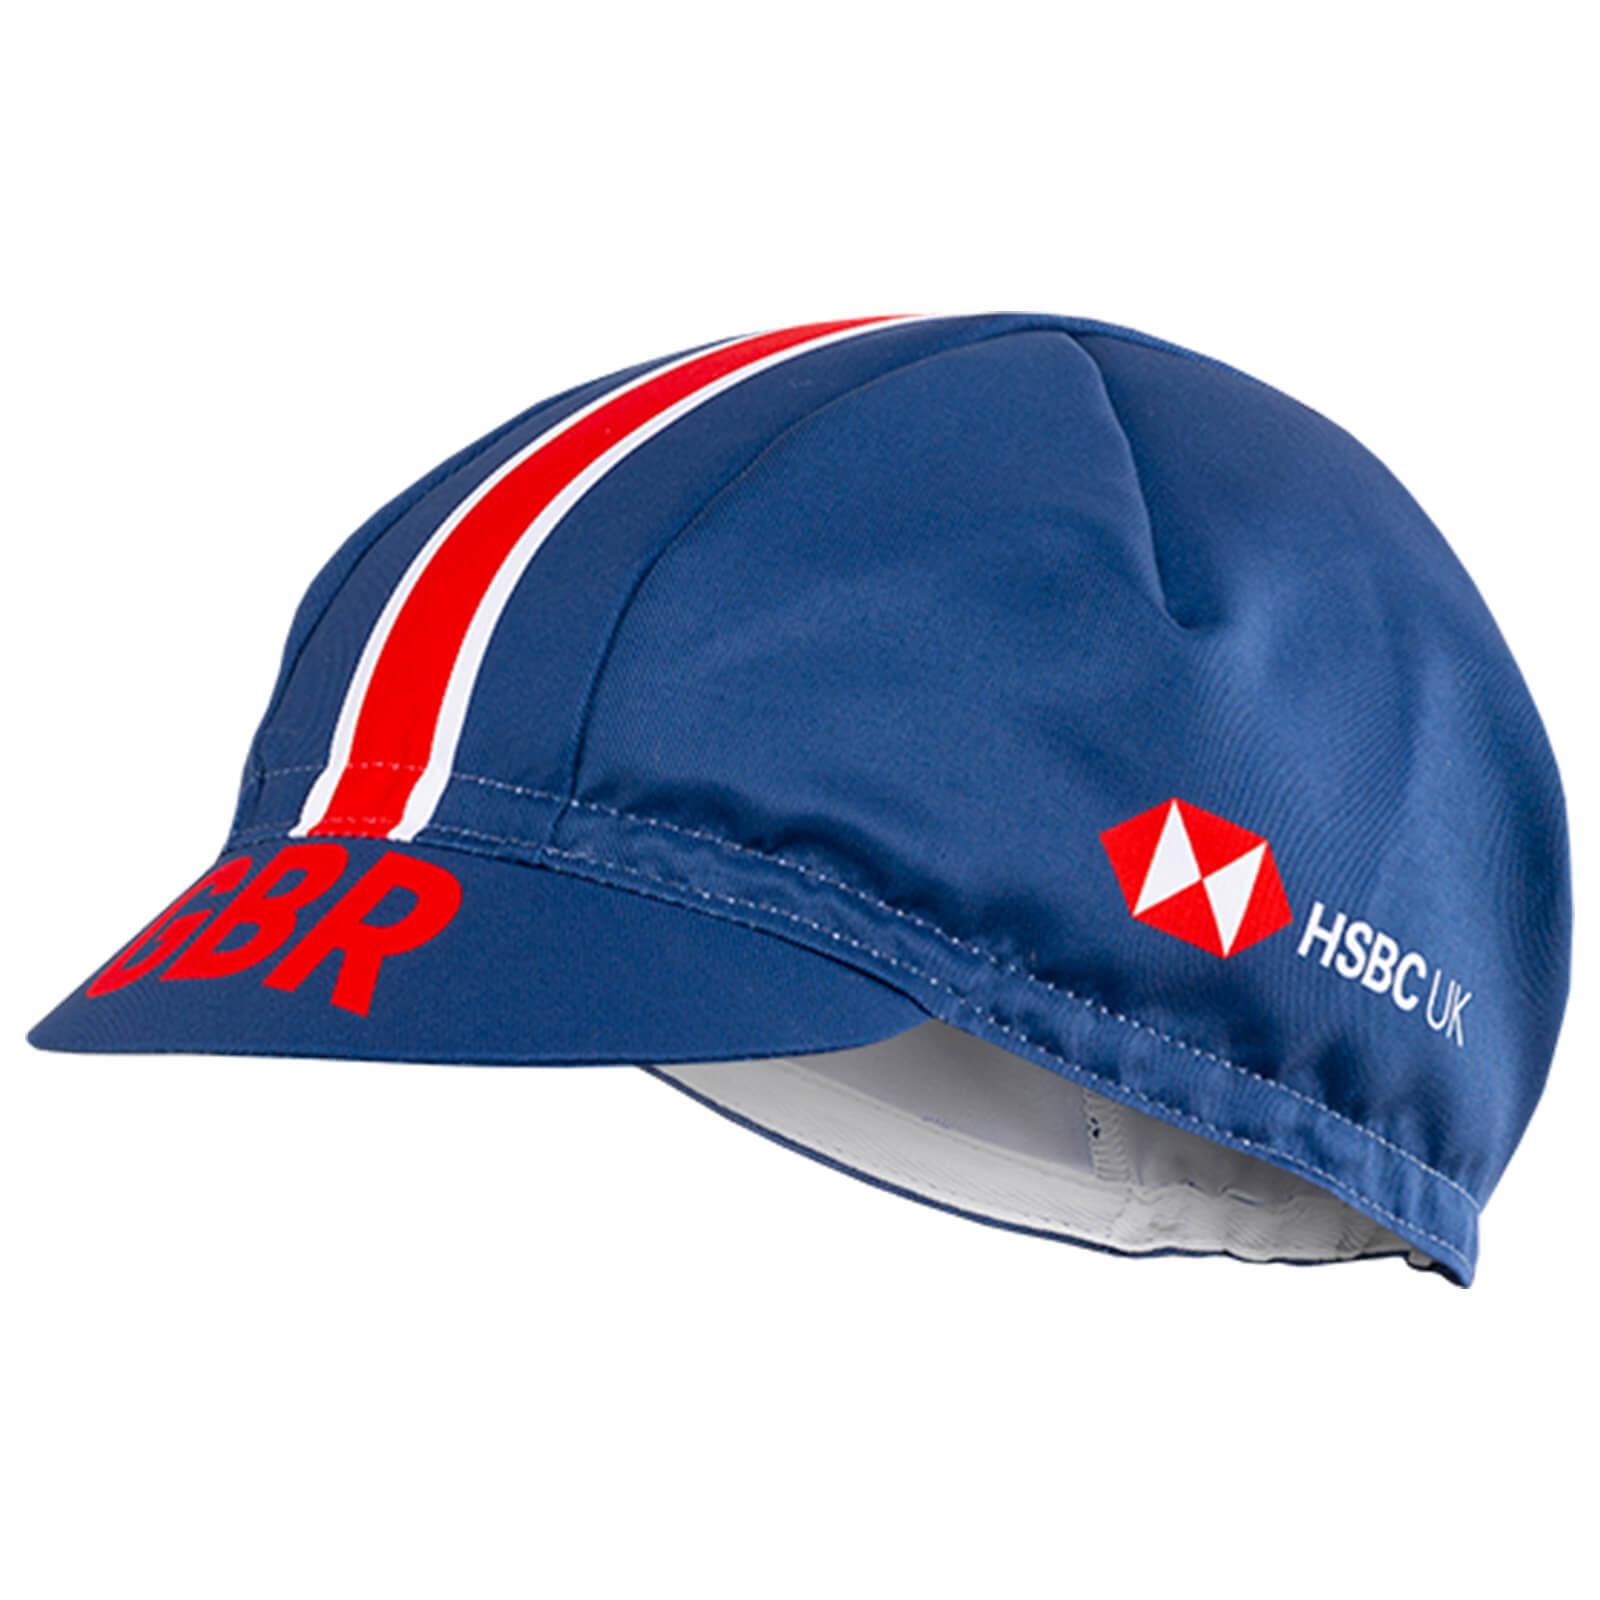 22f827a8 Kalas GBR Replica Summer Cap - Blue   ProBikeKit Australia